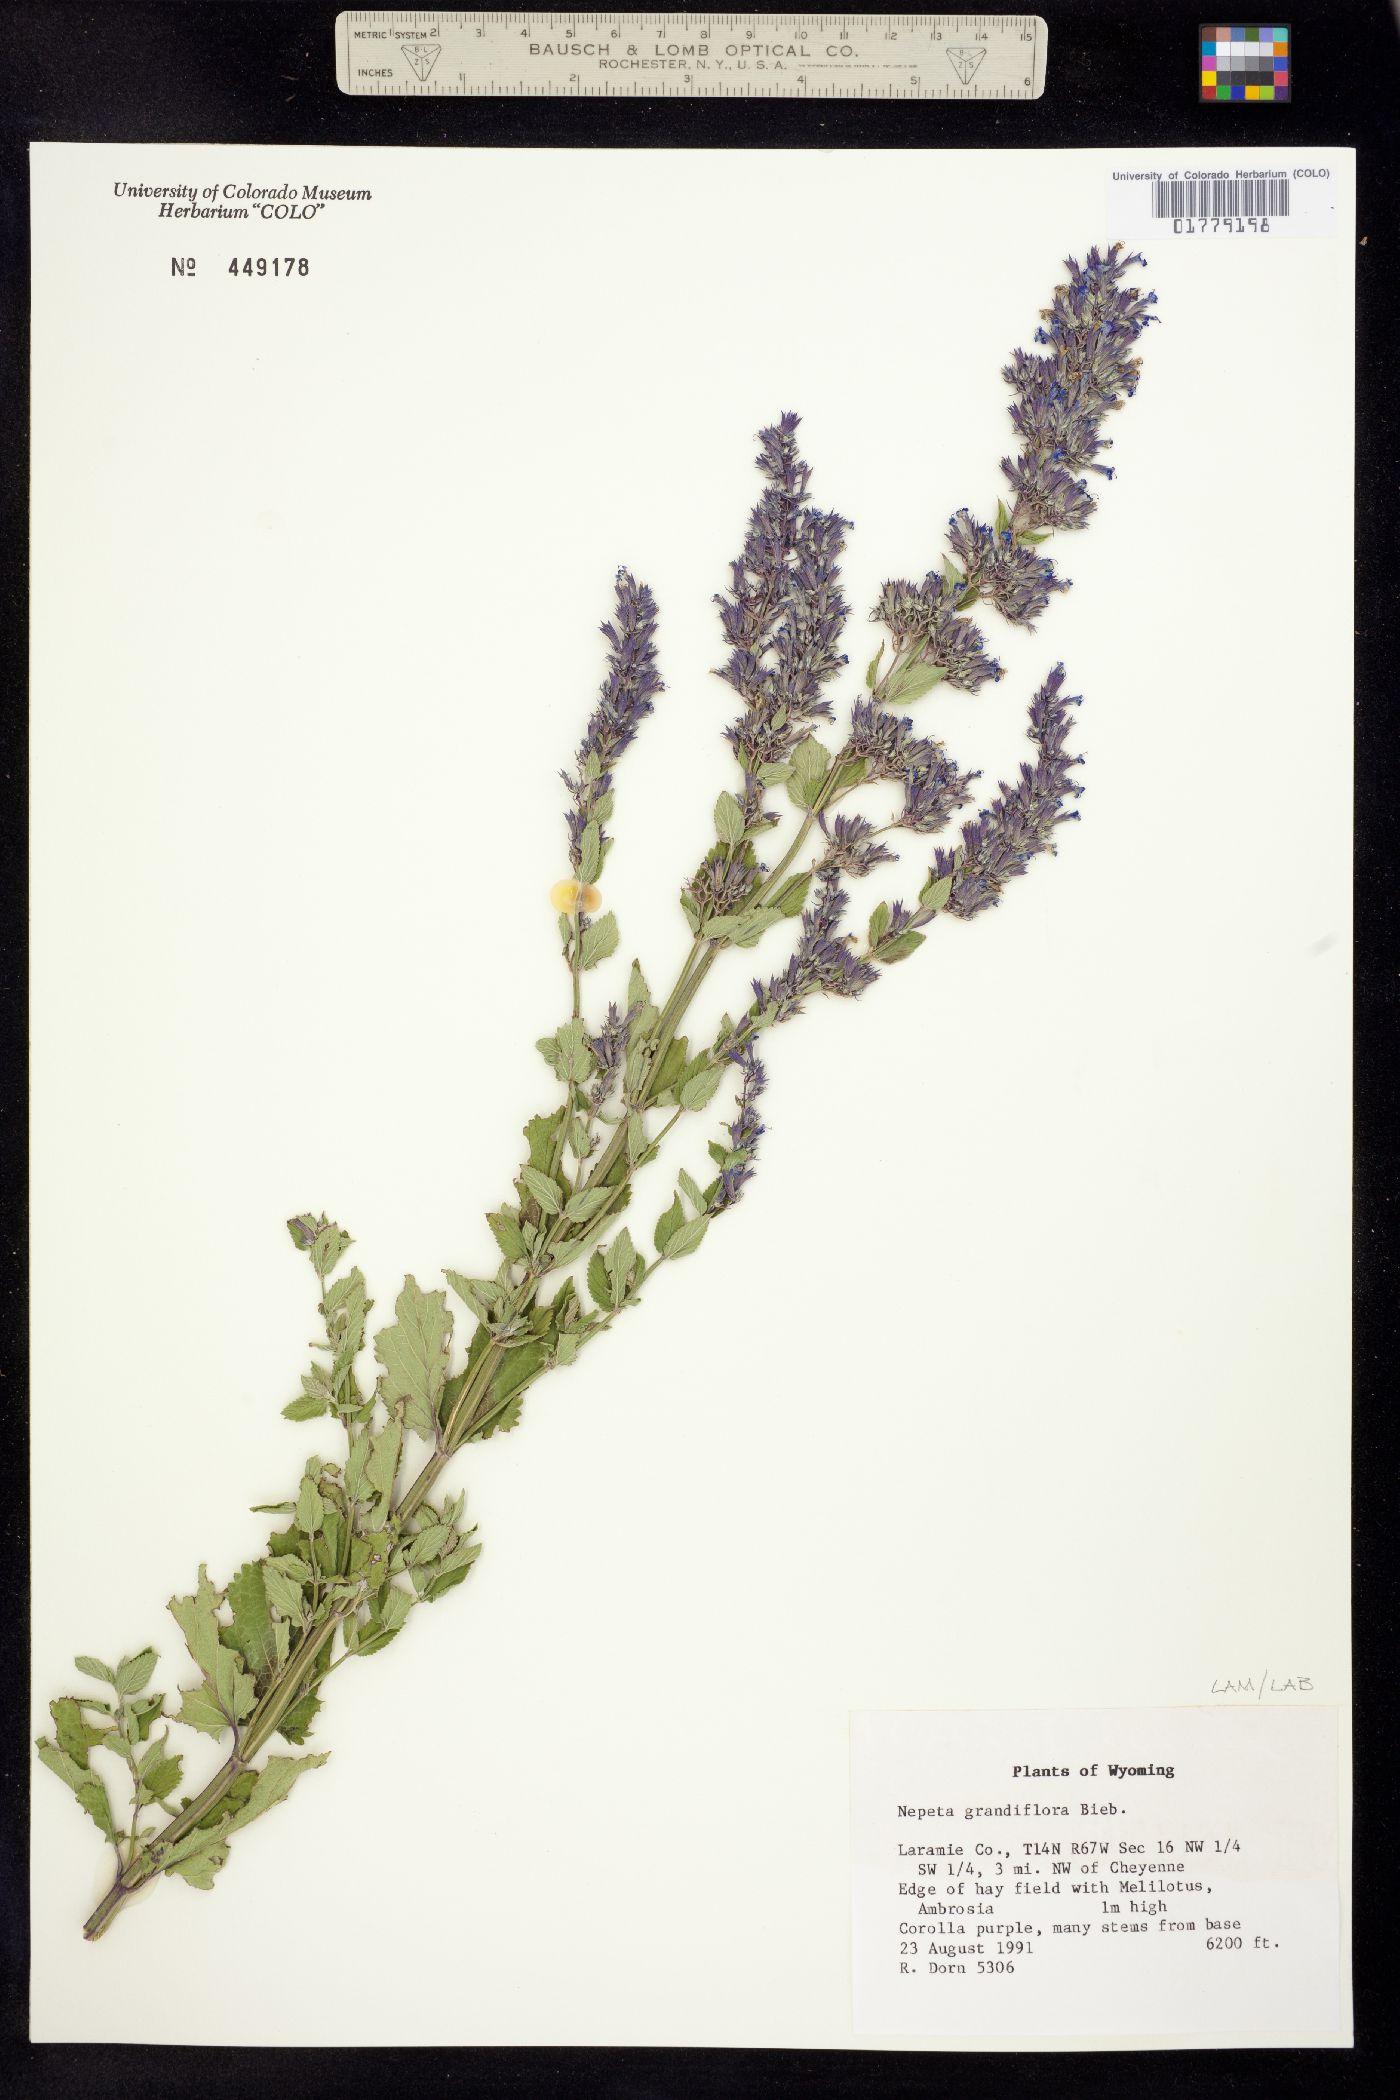 Nepeta grandiflora image